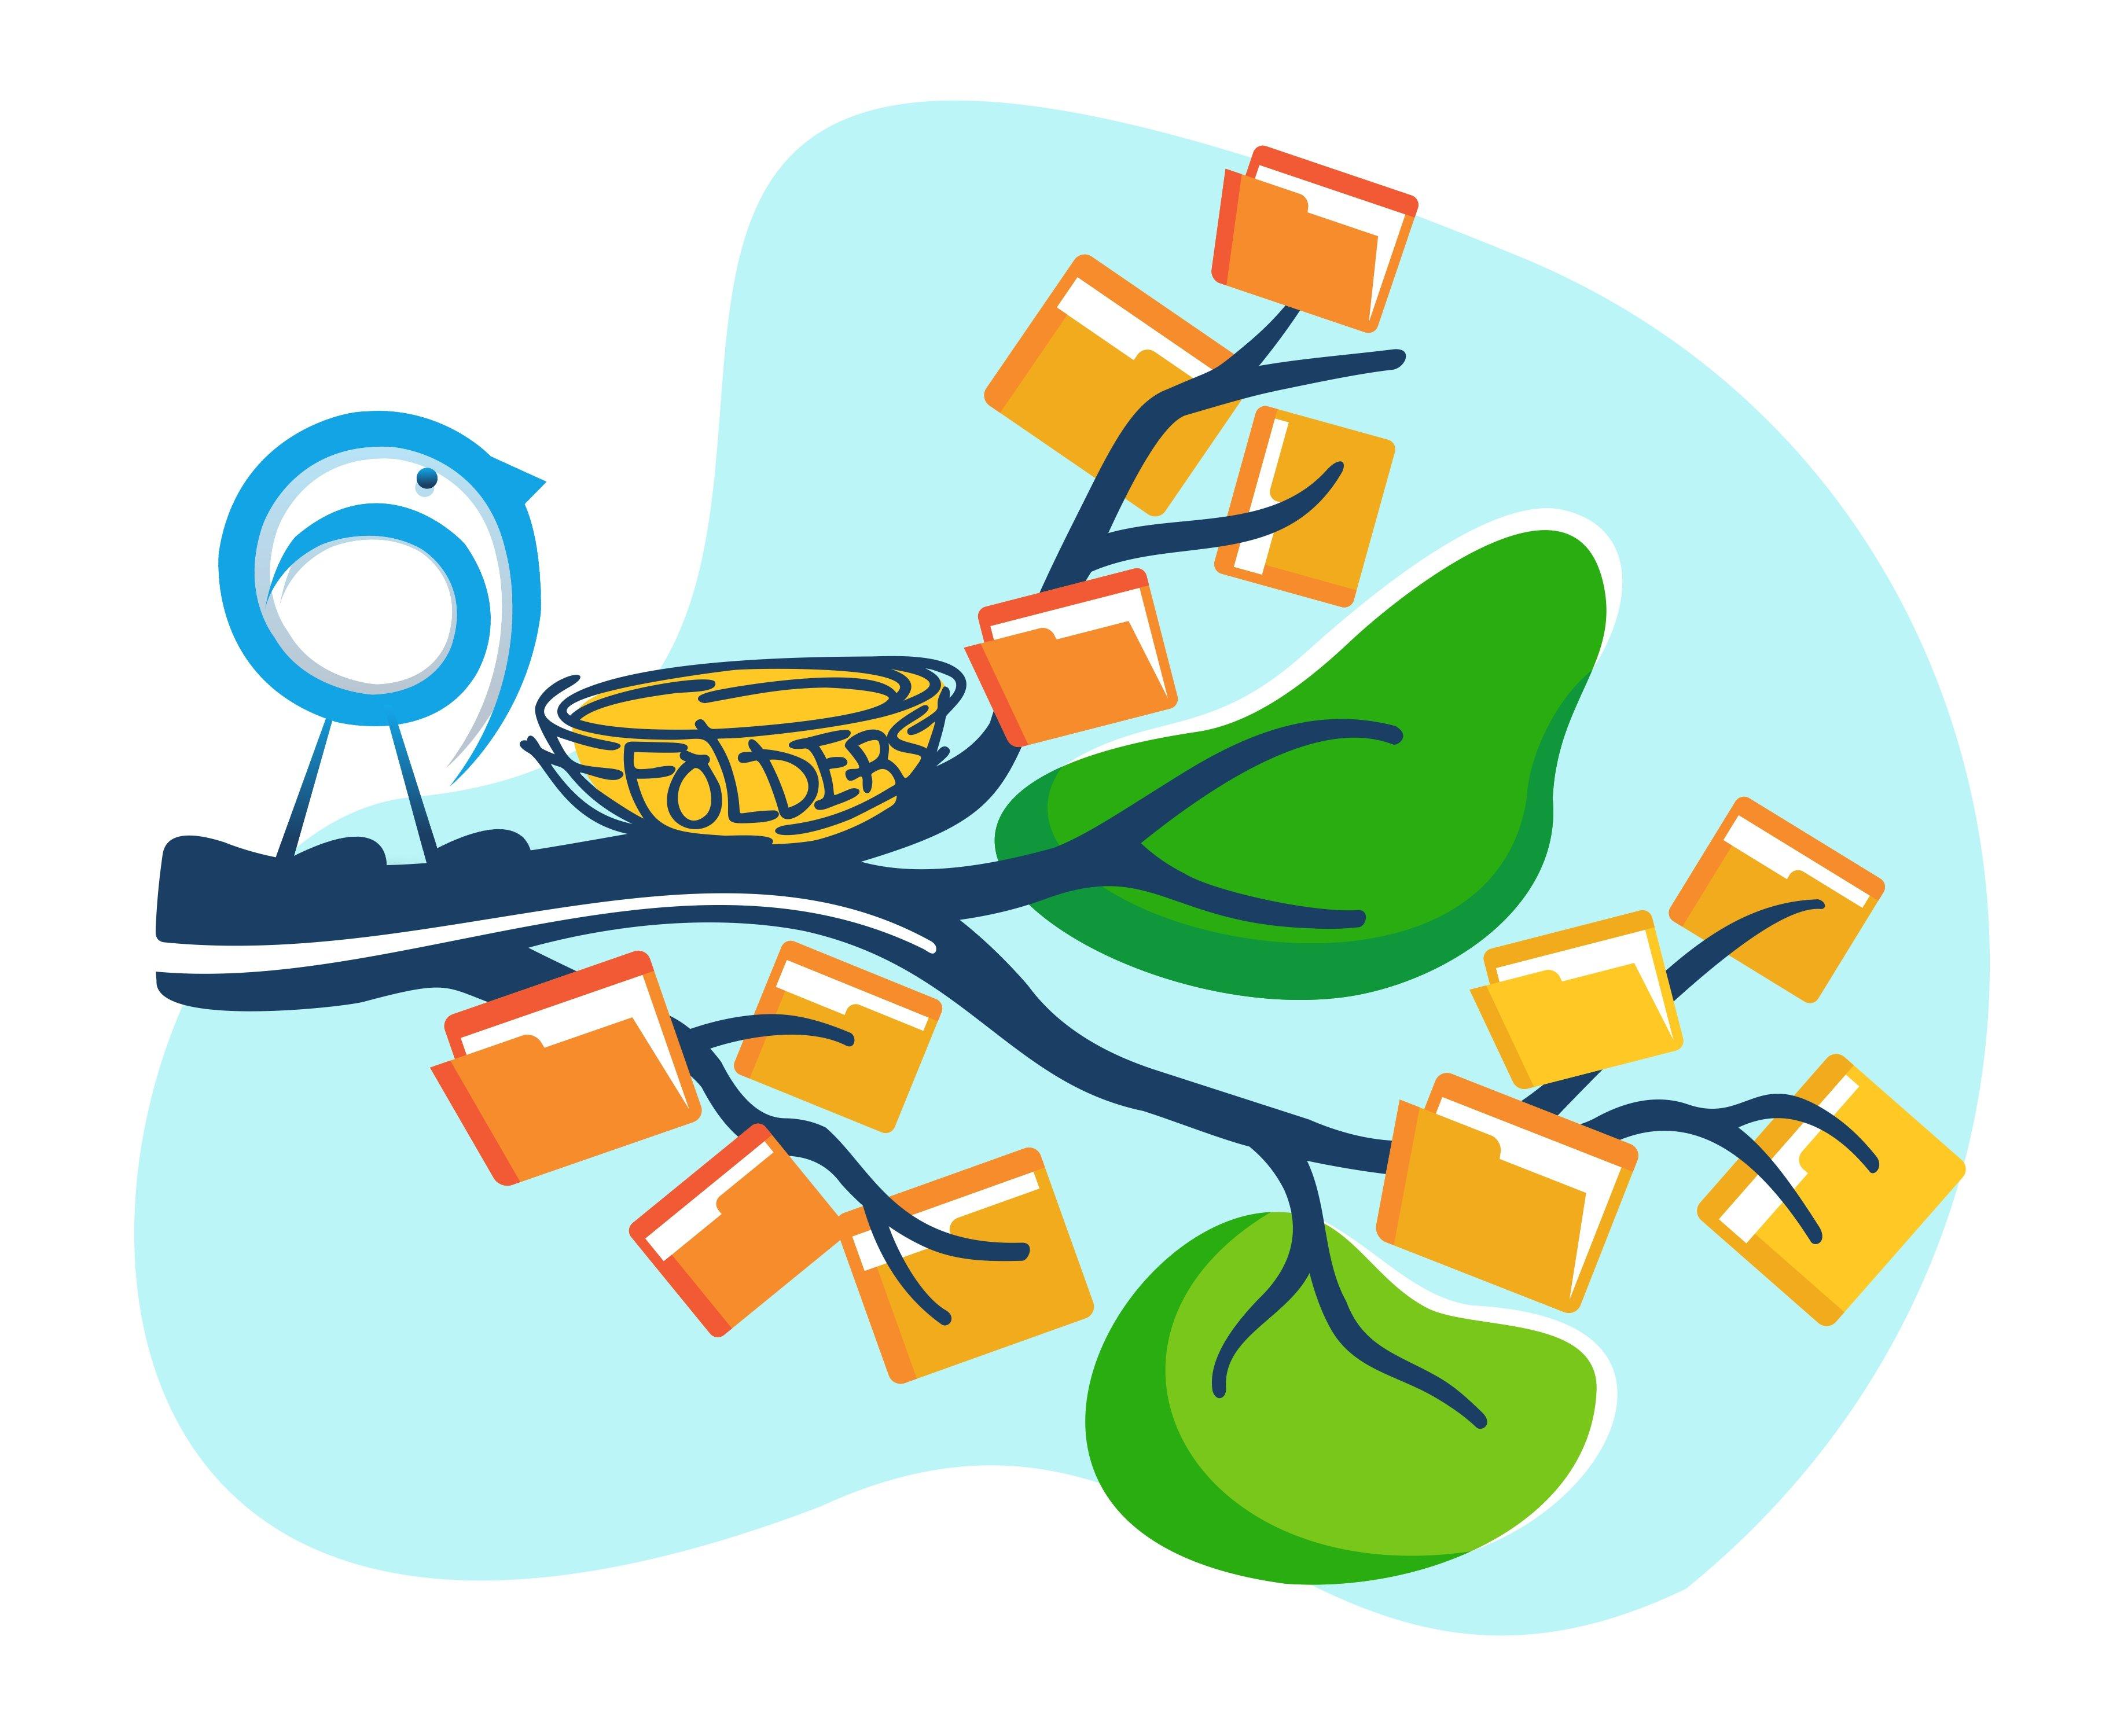 ScribFolders Illustration